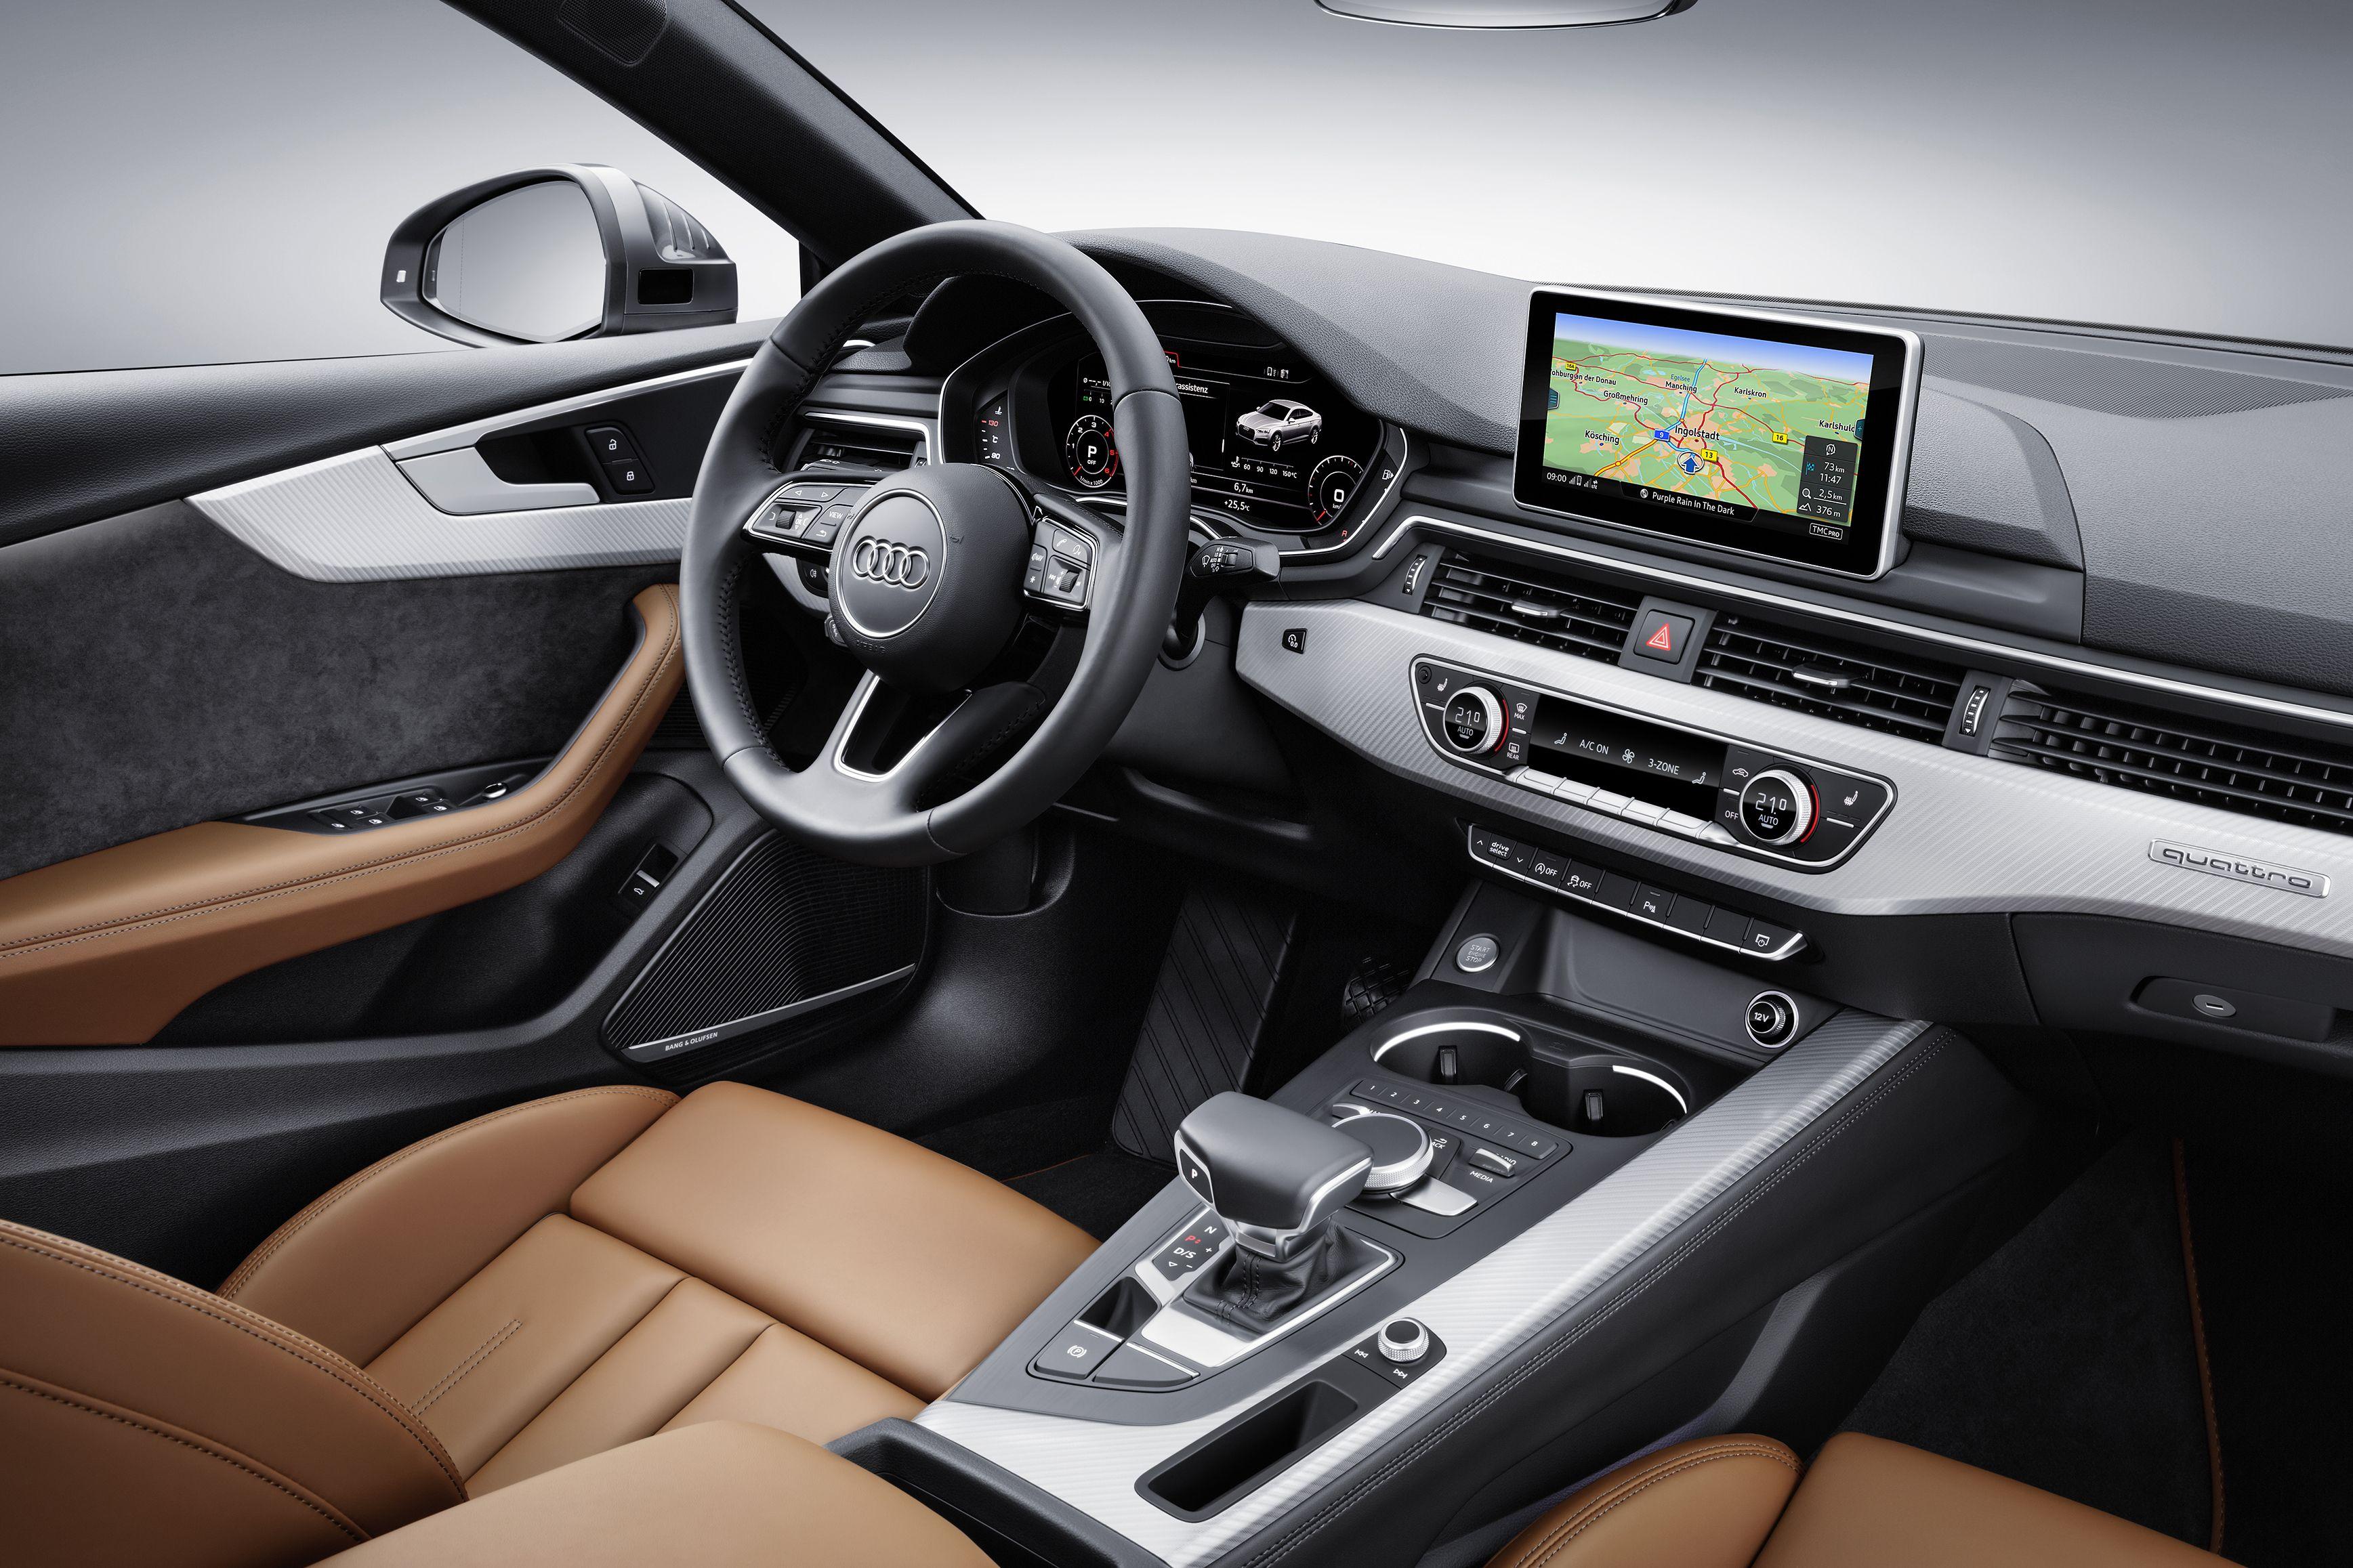 The New Audi A7 Audi A7 Audi Rs3 Audi A7 Sportback